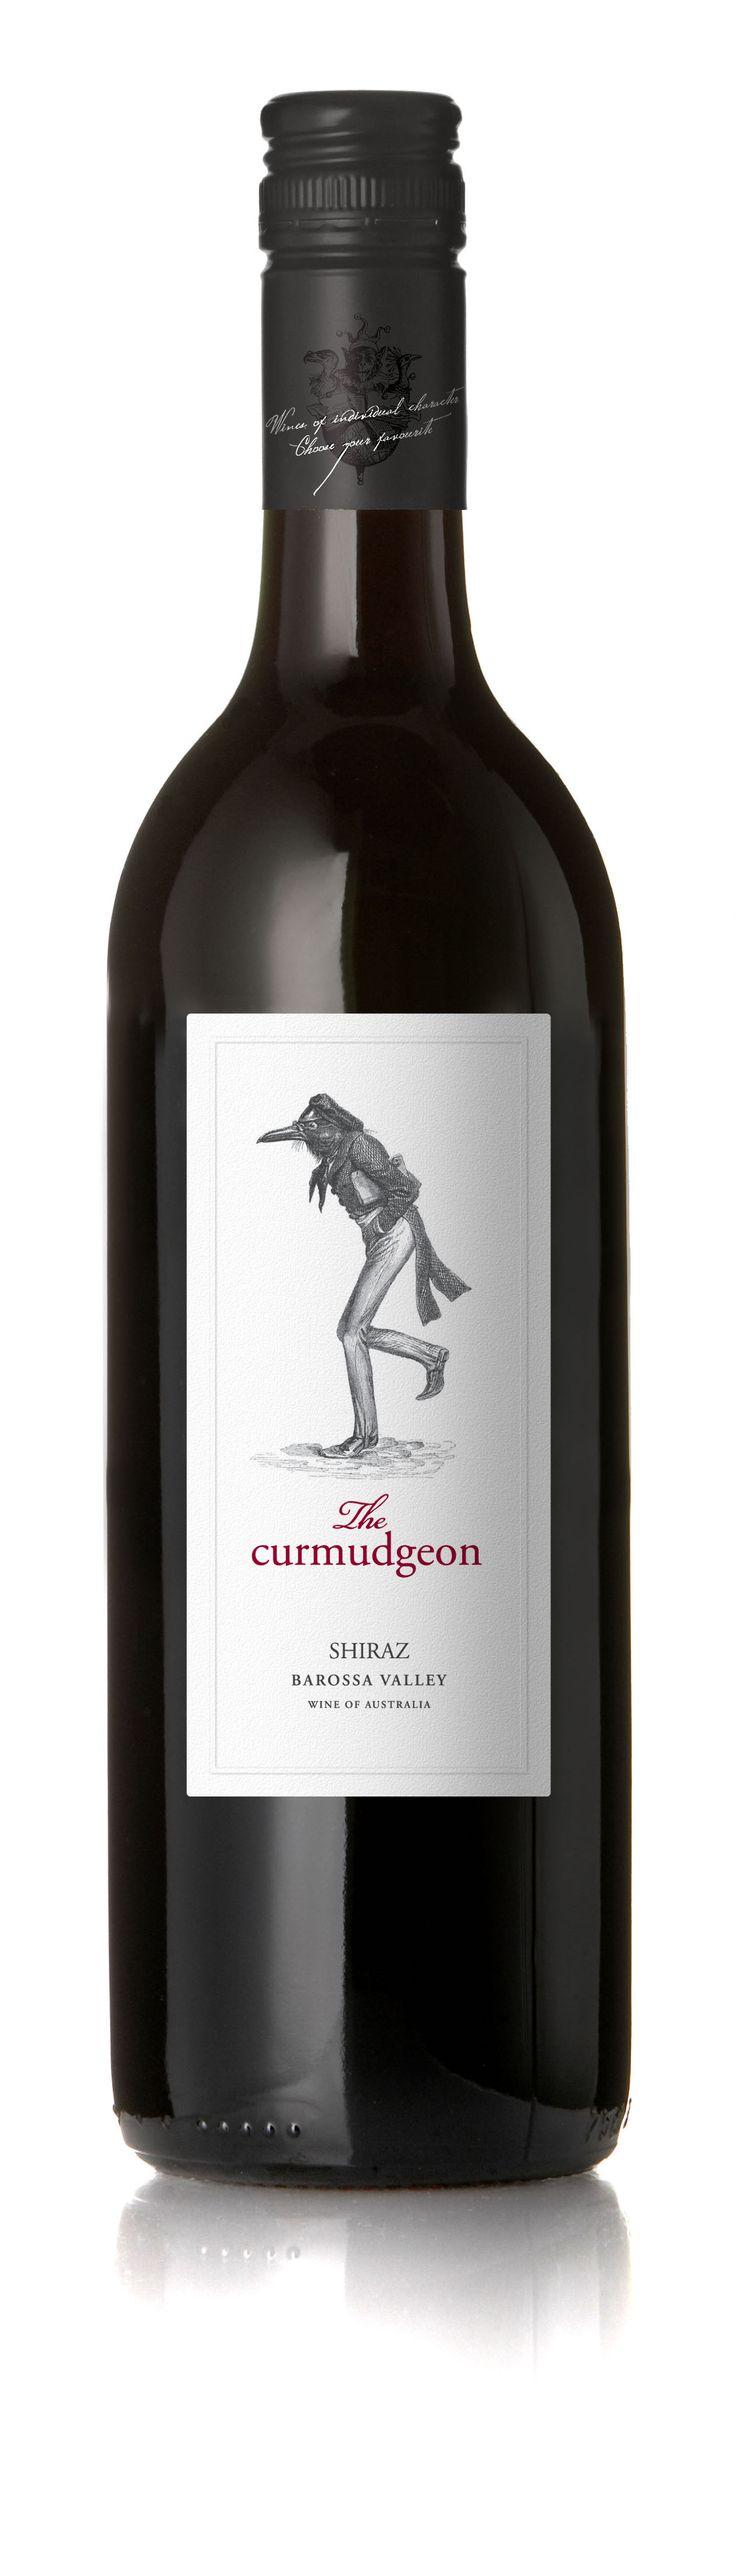 Australia - The Curmudgeon